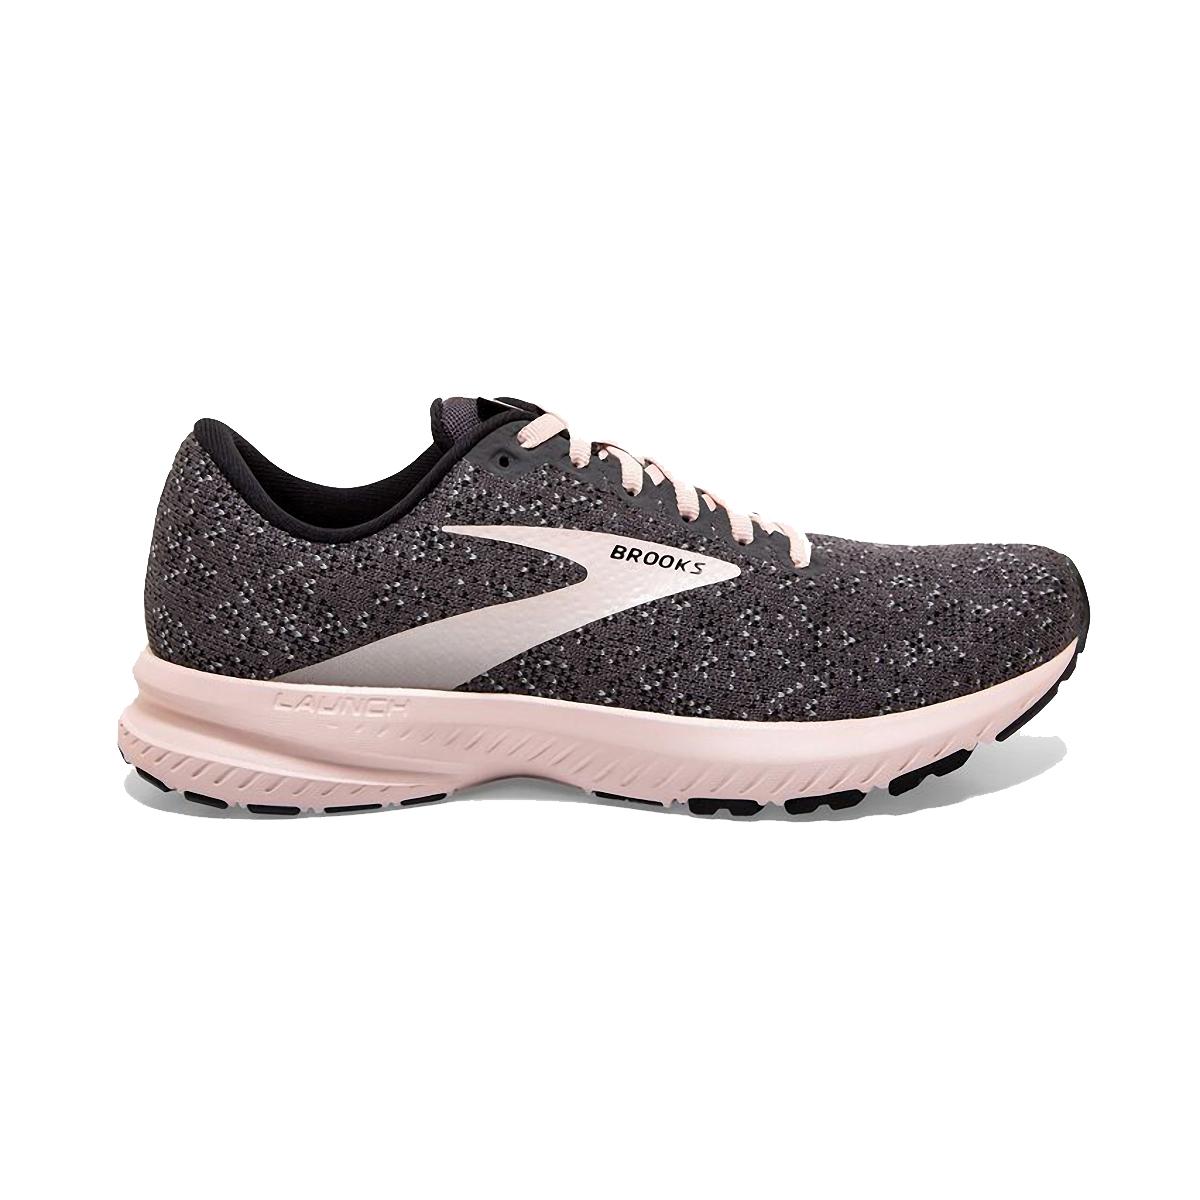 Women's Brooks Launch 7 Running Shoe - Color: Black/Pearl/Pink - Size: 5 - Width: Regular, Black/Pearl/Pink, large, image 1